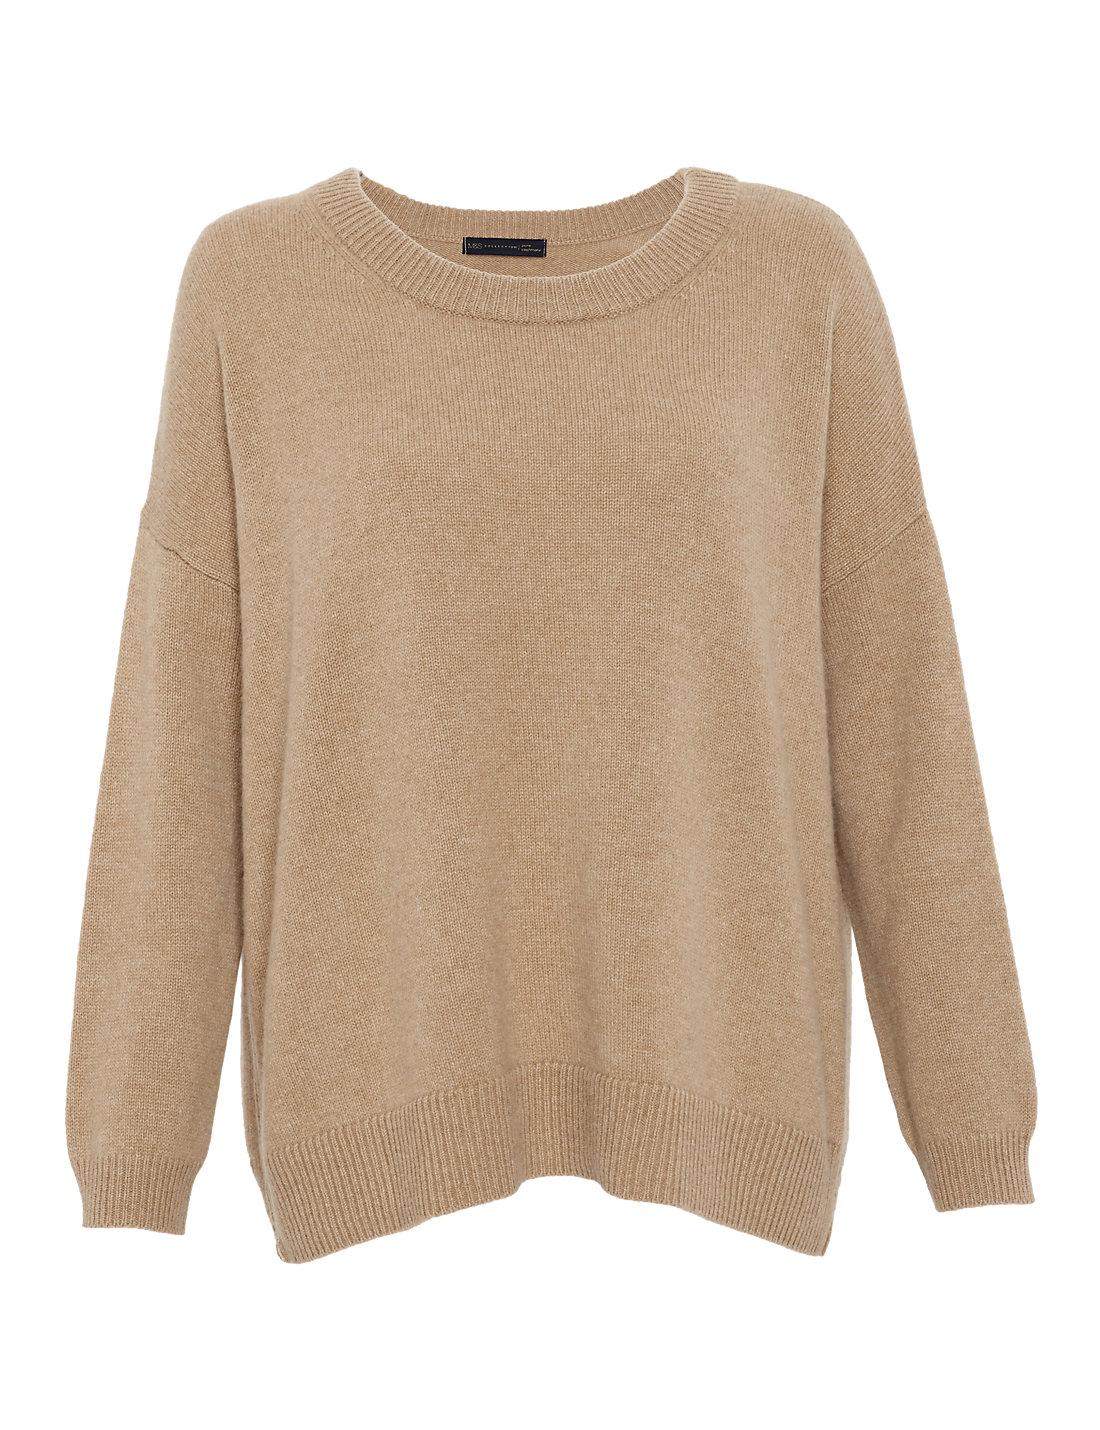 Pure Cashmere Side Zip Jumper | M&S